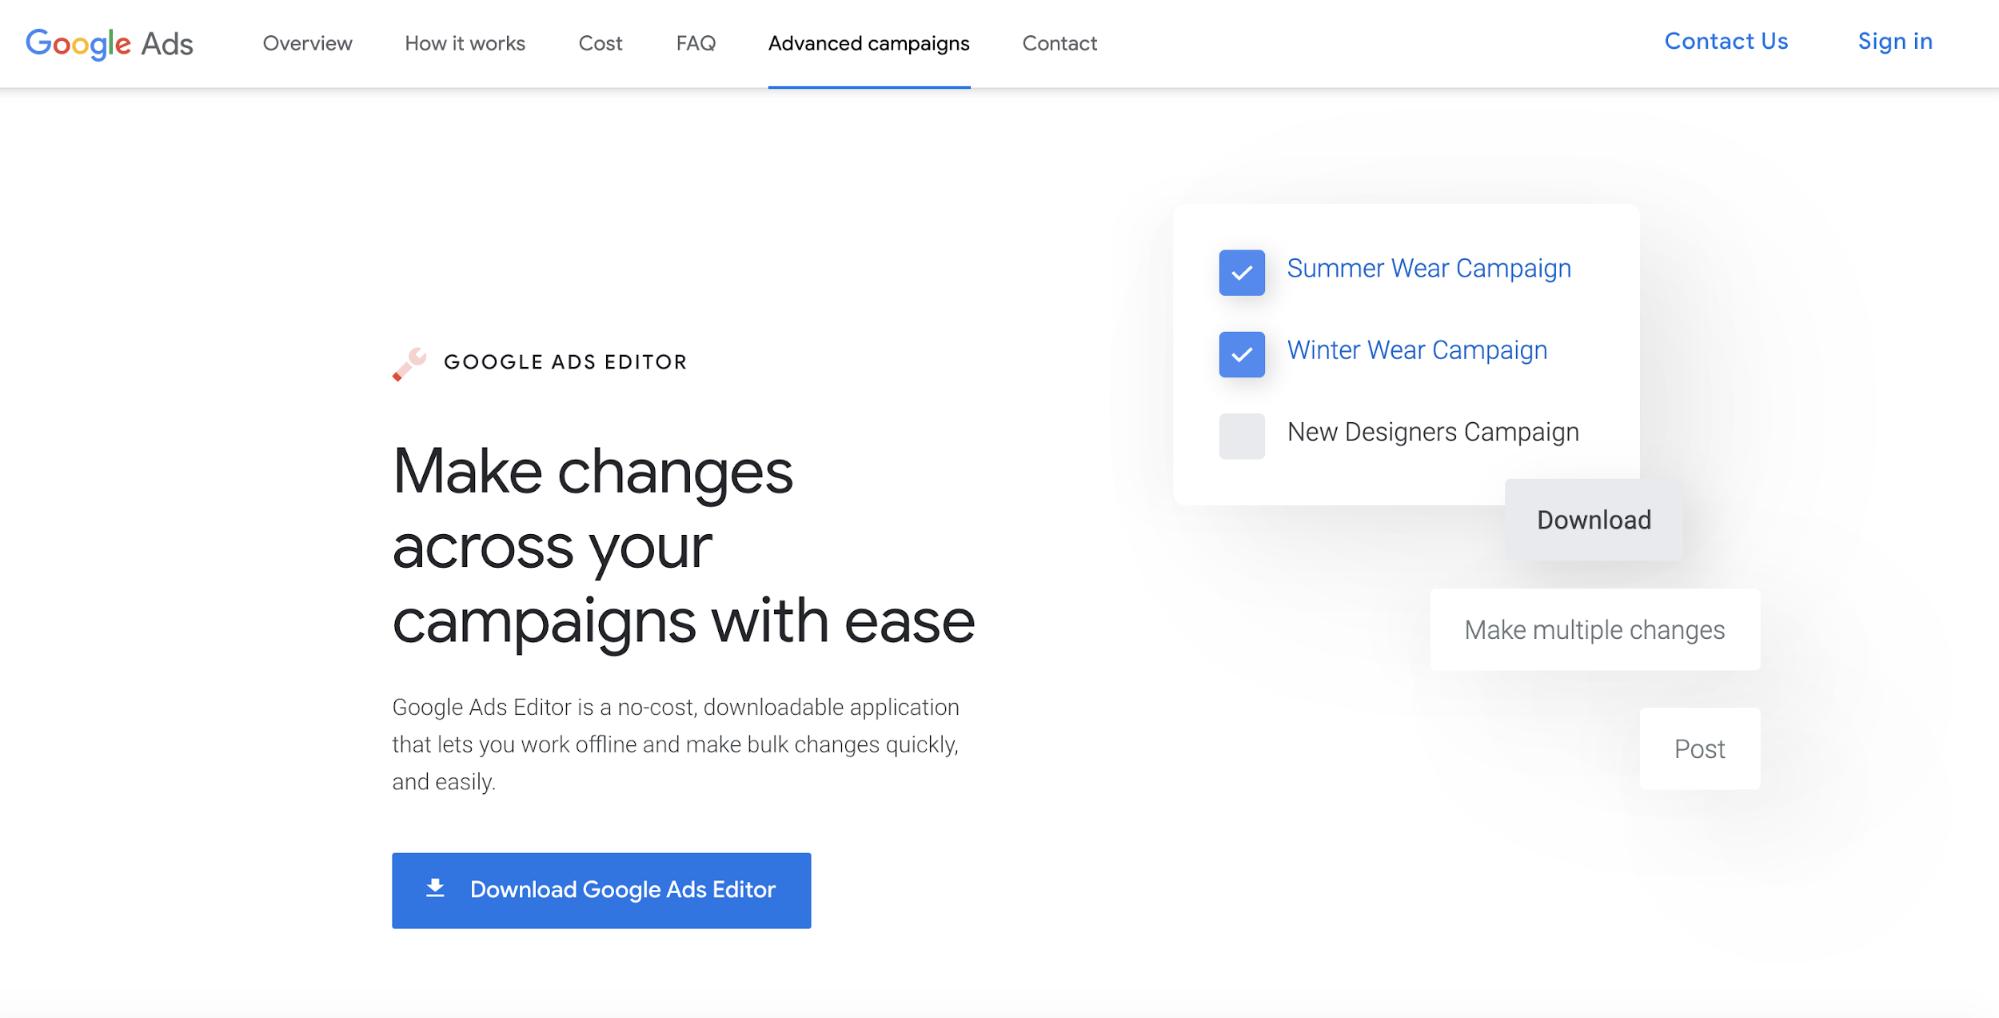 Google Ads Editor Download Screen